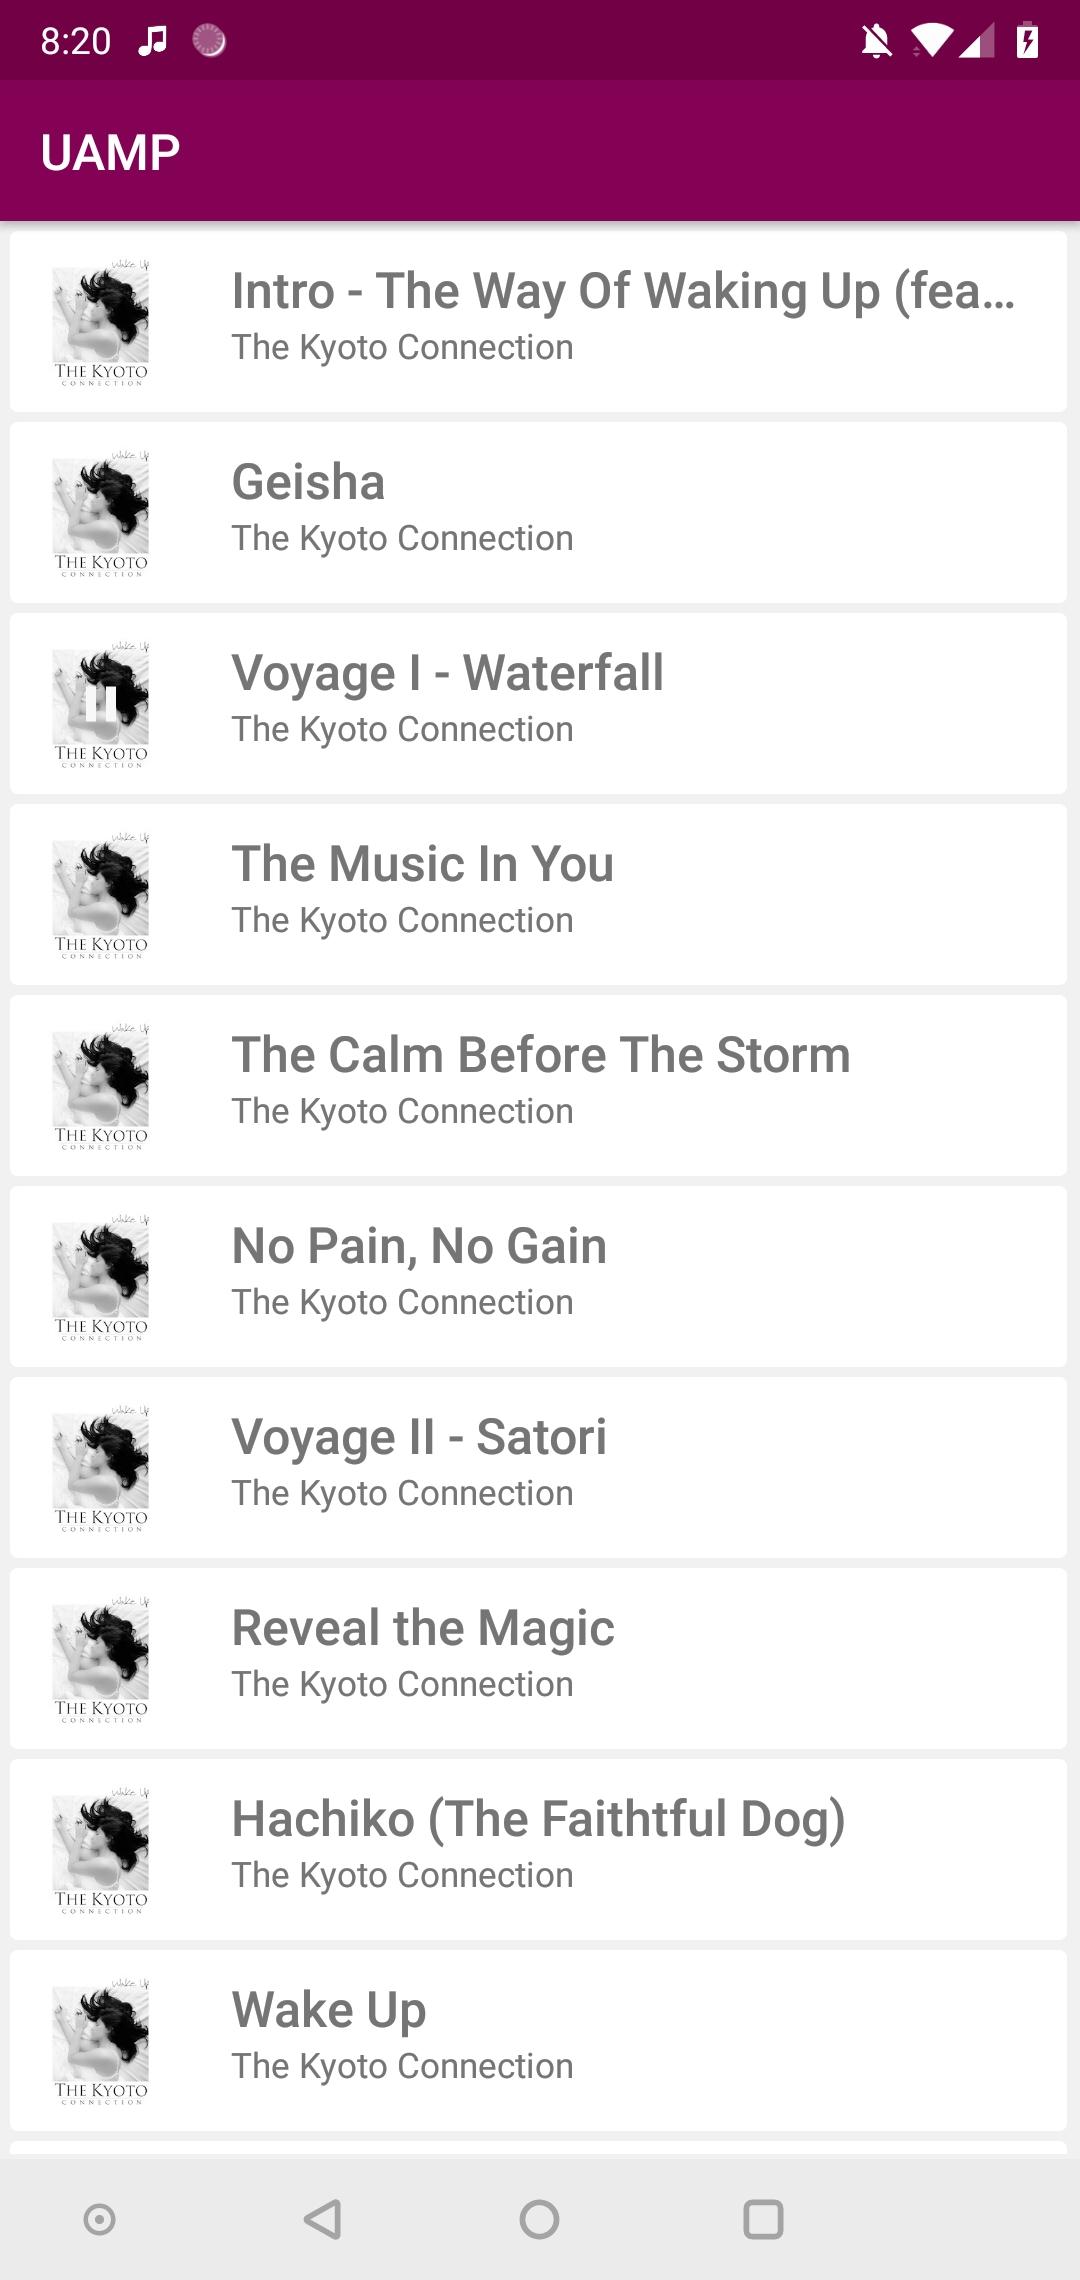 Google updates 'Universal Android Music Player' developer sample app